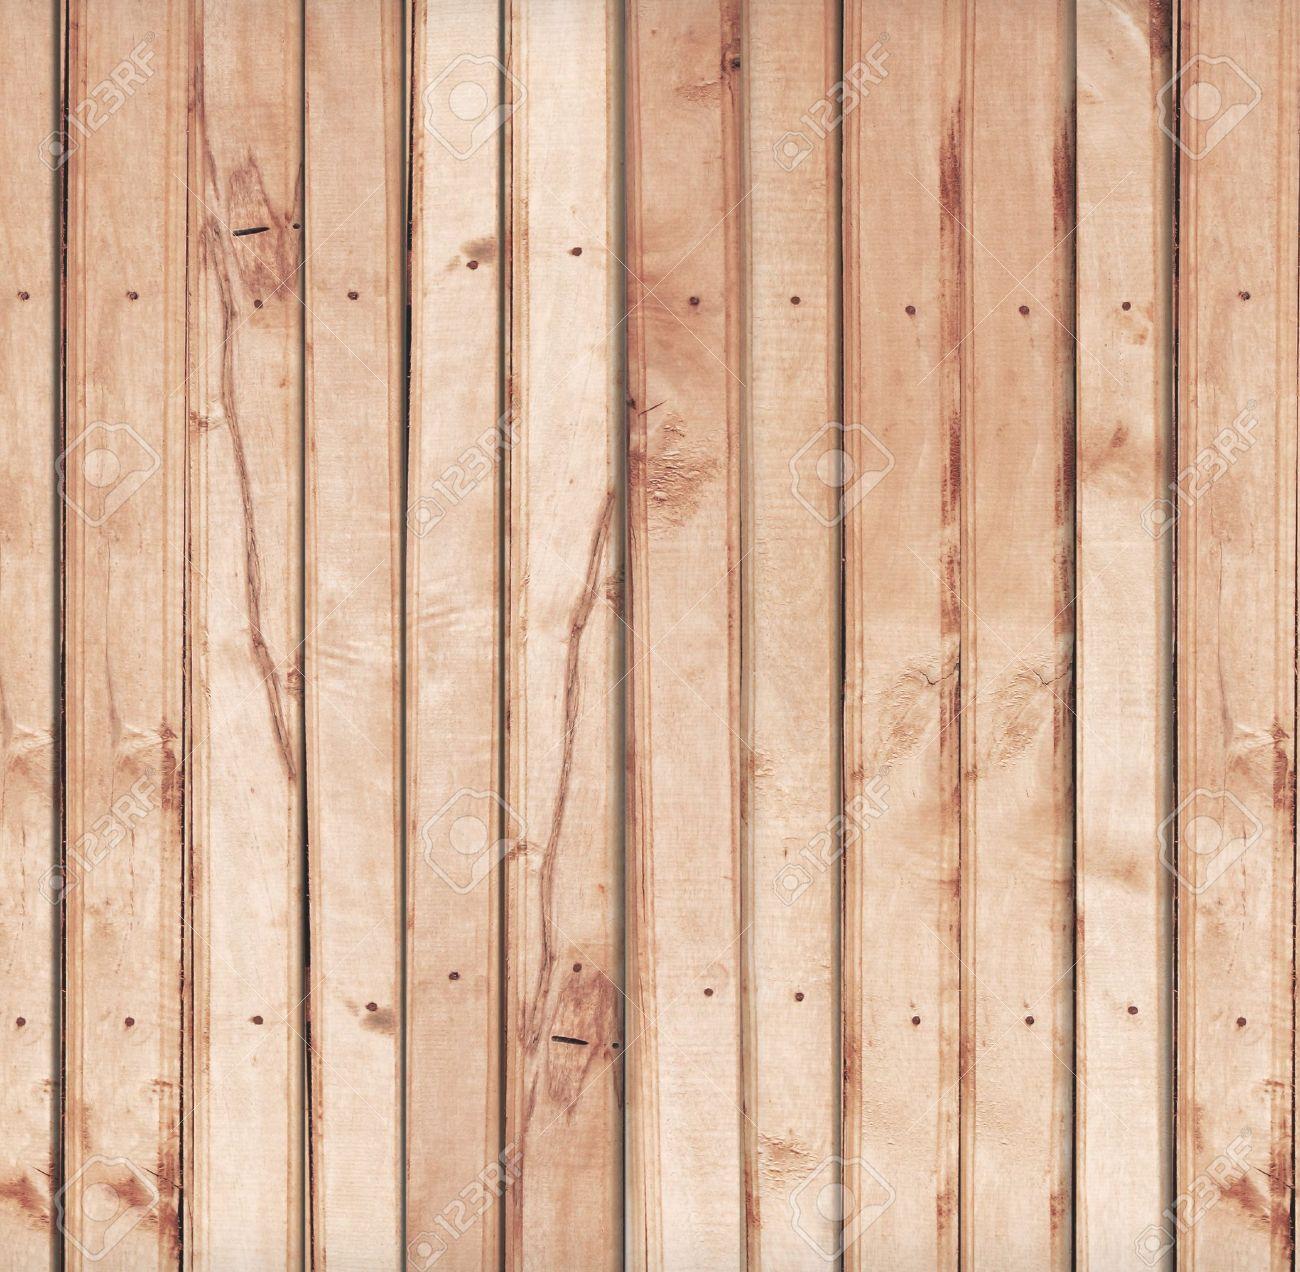 Background of old wood panels Stock Photo - 10023146